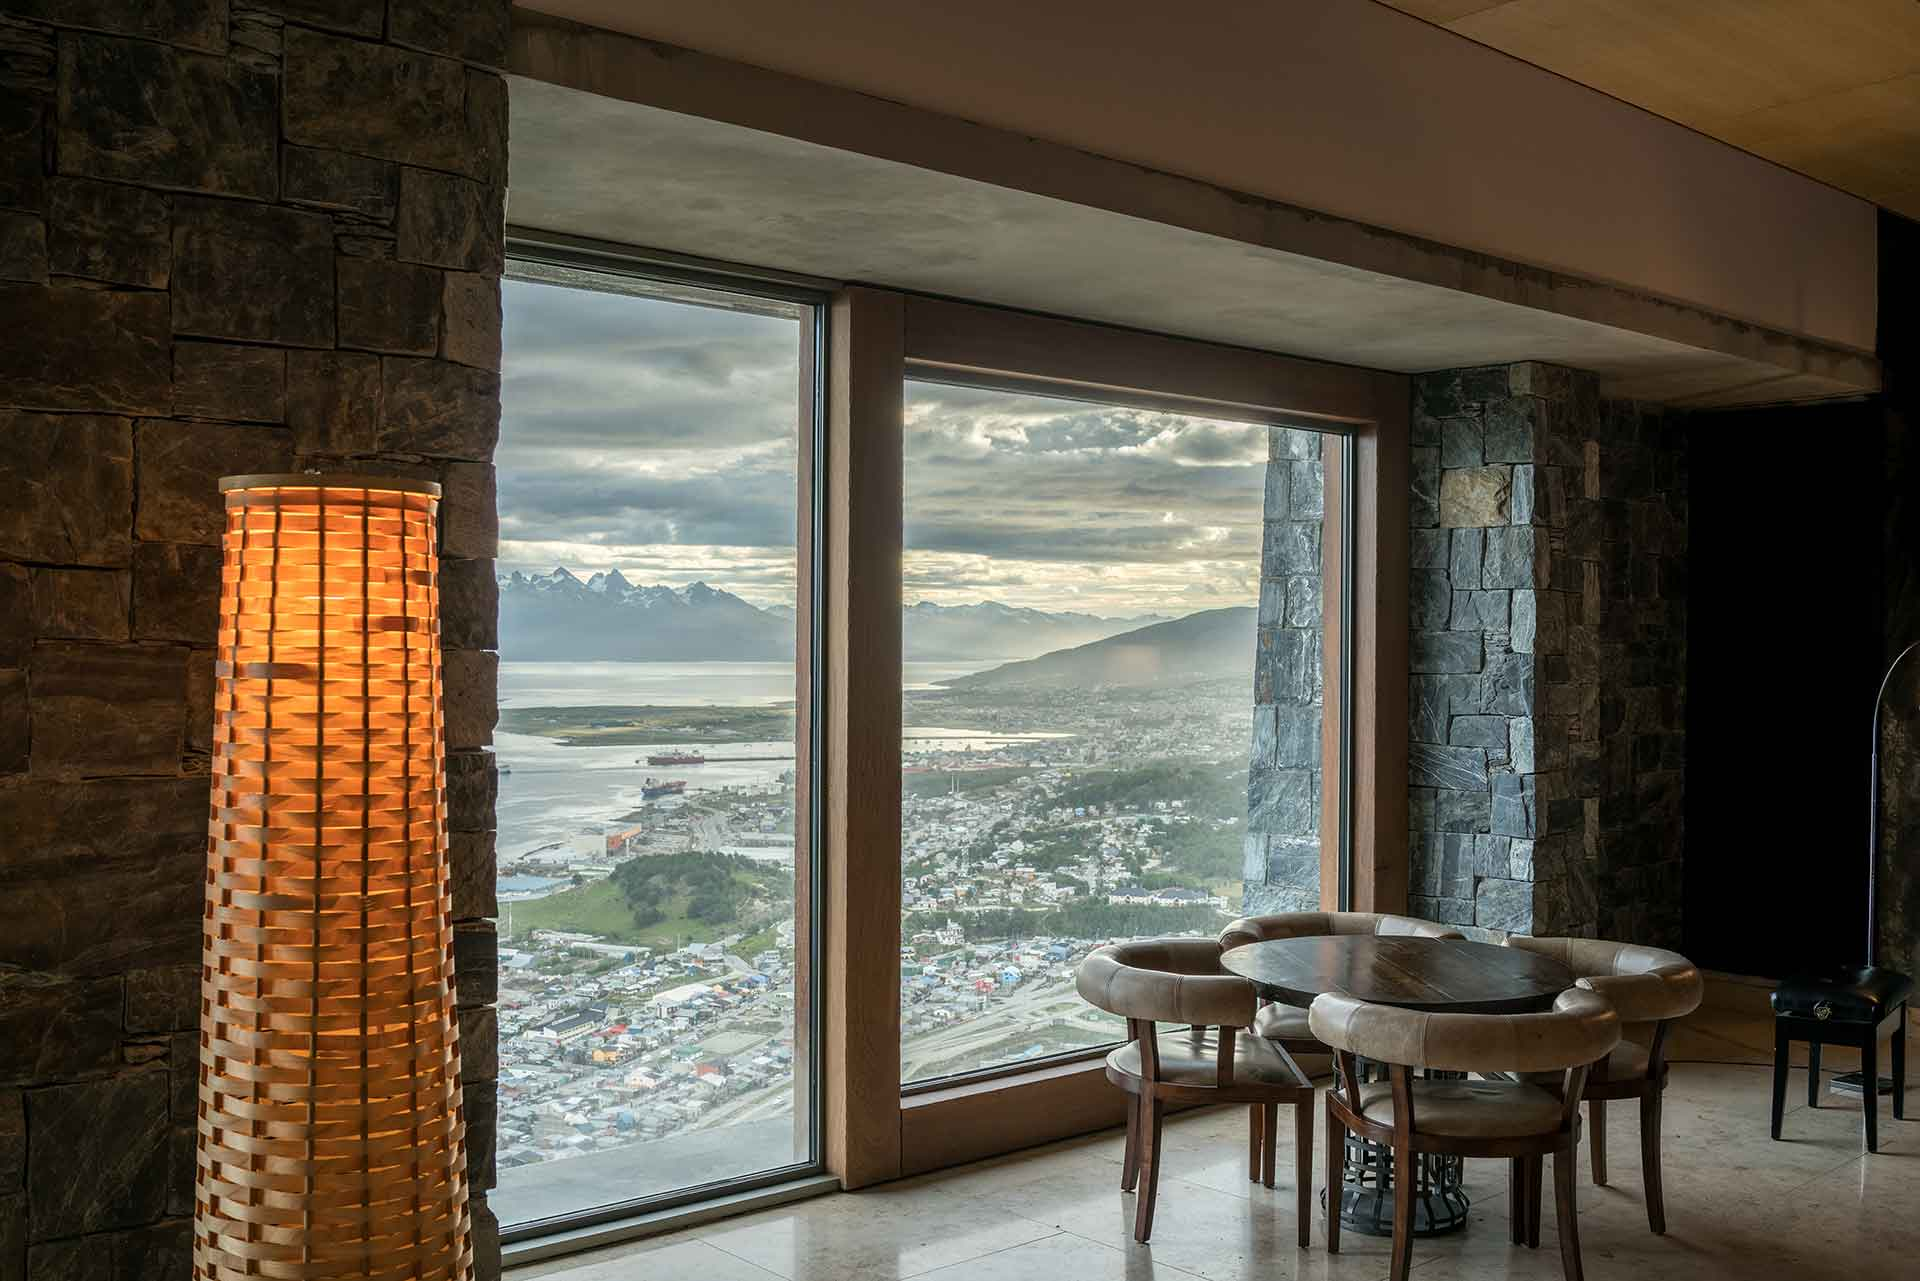 Hotel Arakur Ushuaia